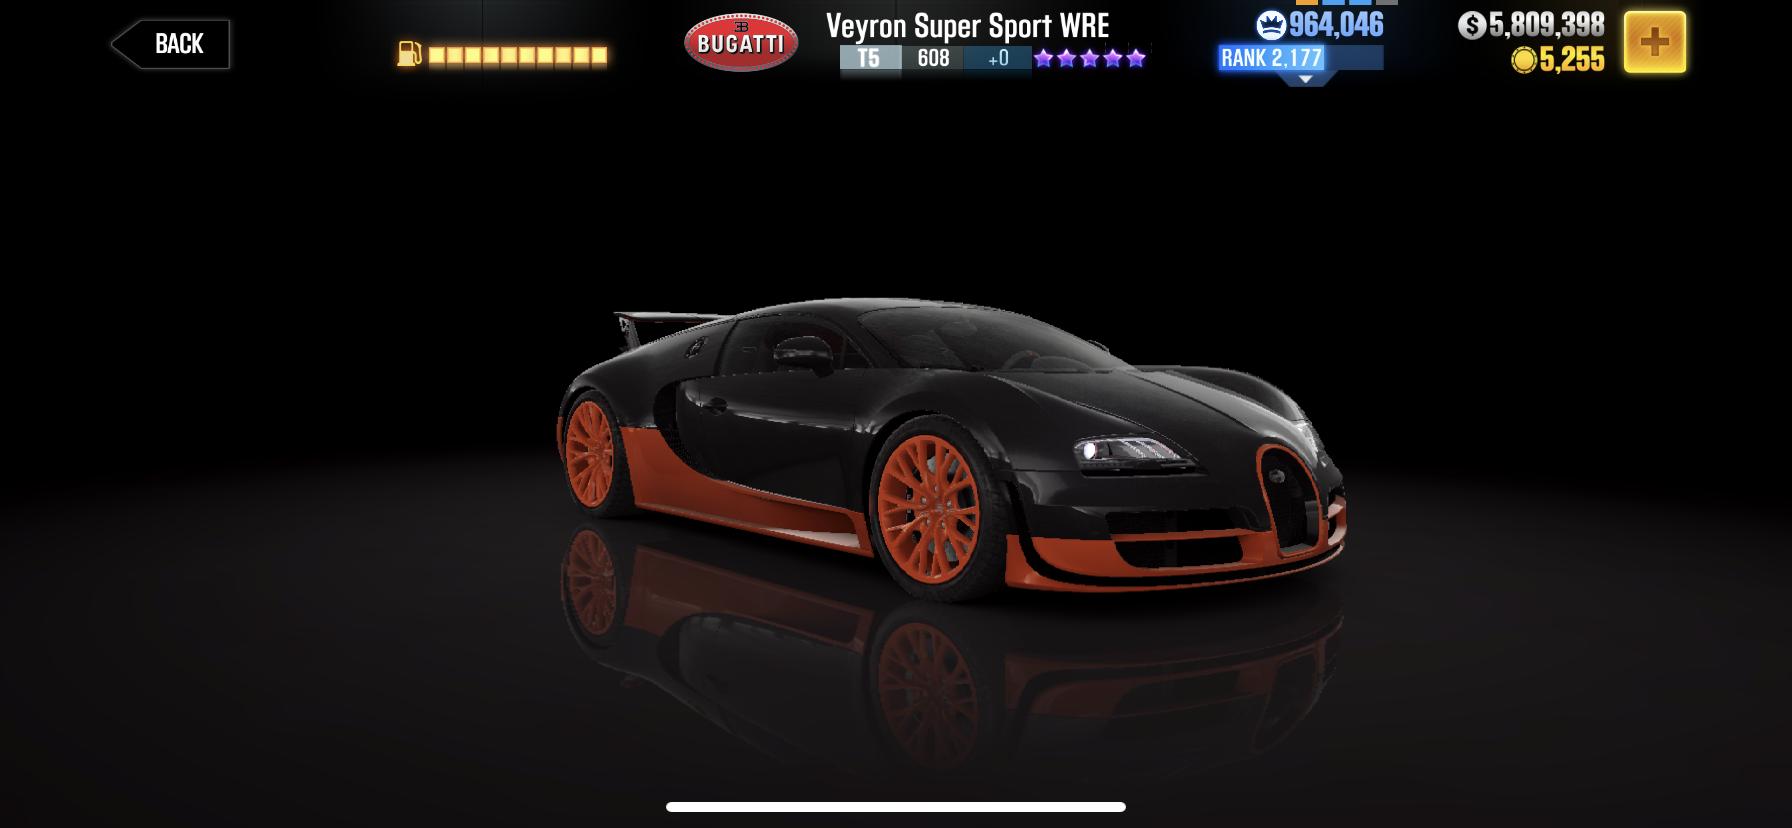 Bugatti Veyron Super Sport Price >> Bugatti Veyron Super Sport Wre Csr Racing Wiki Fandom